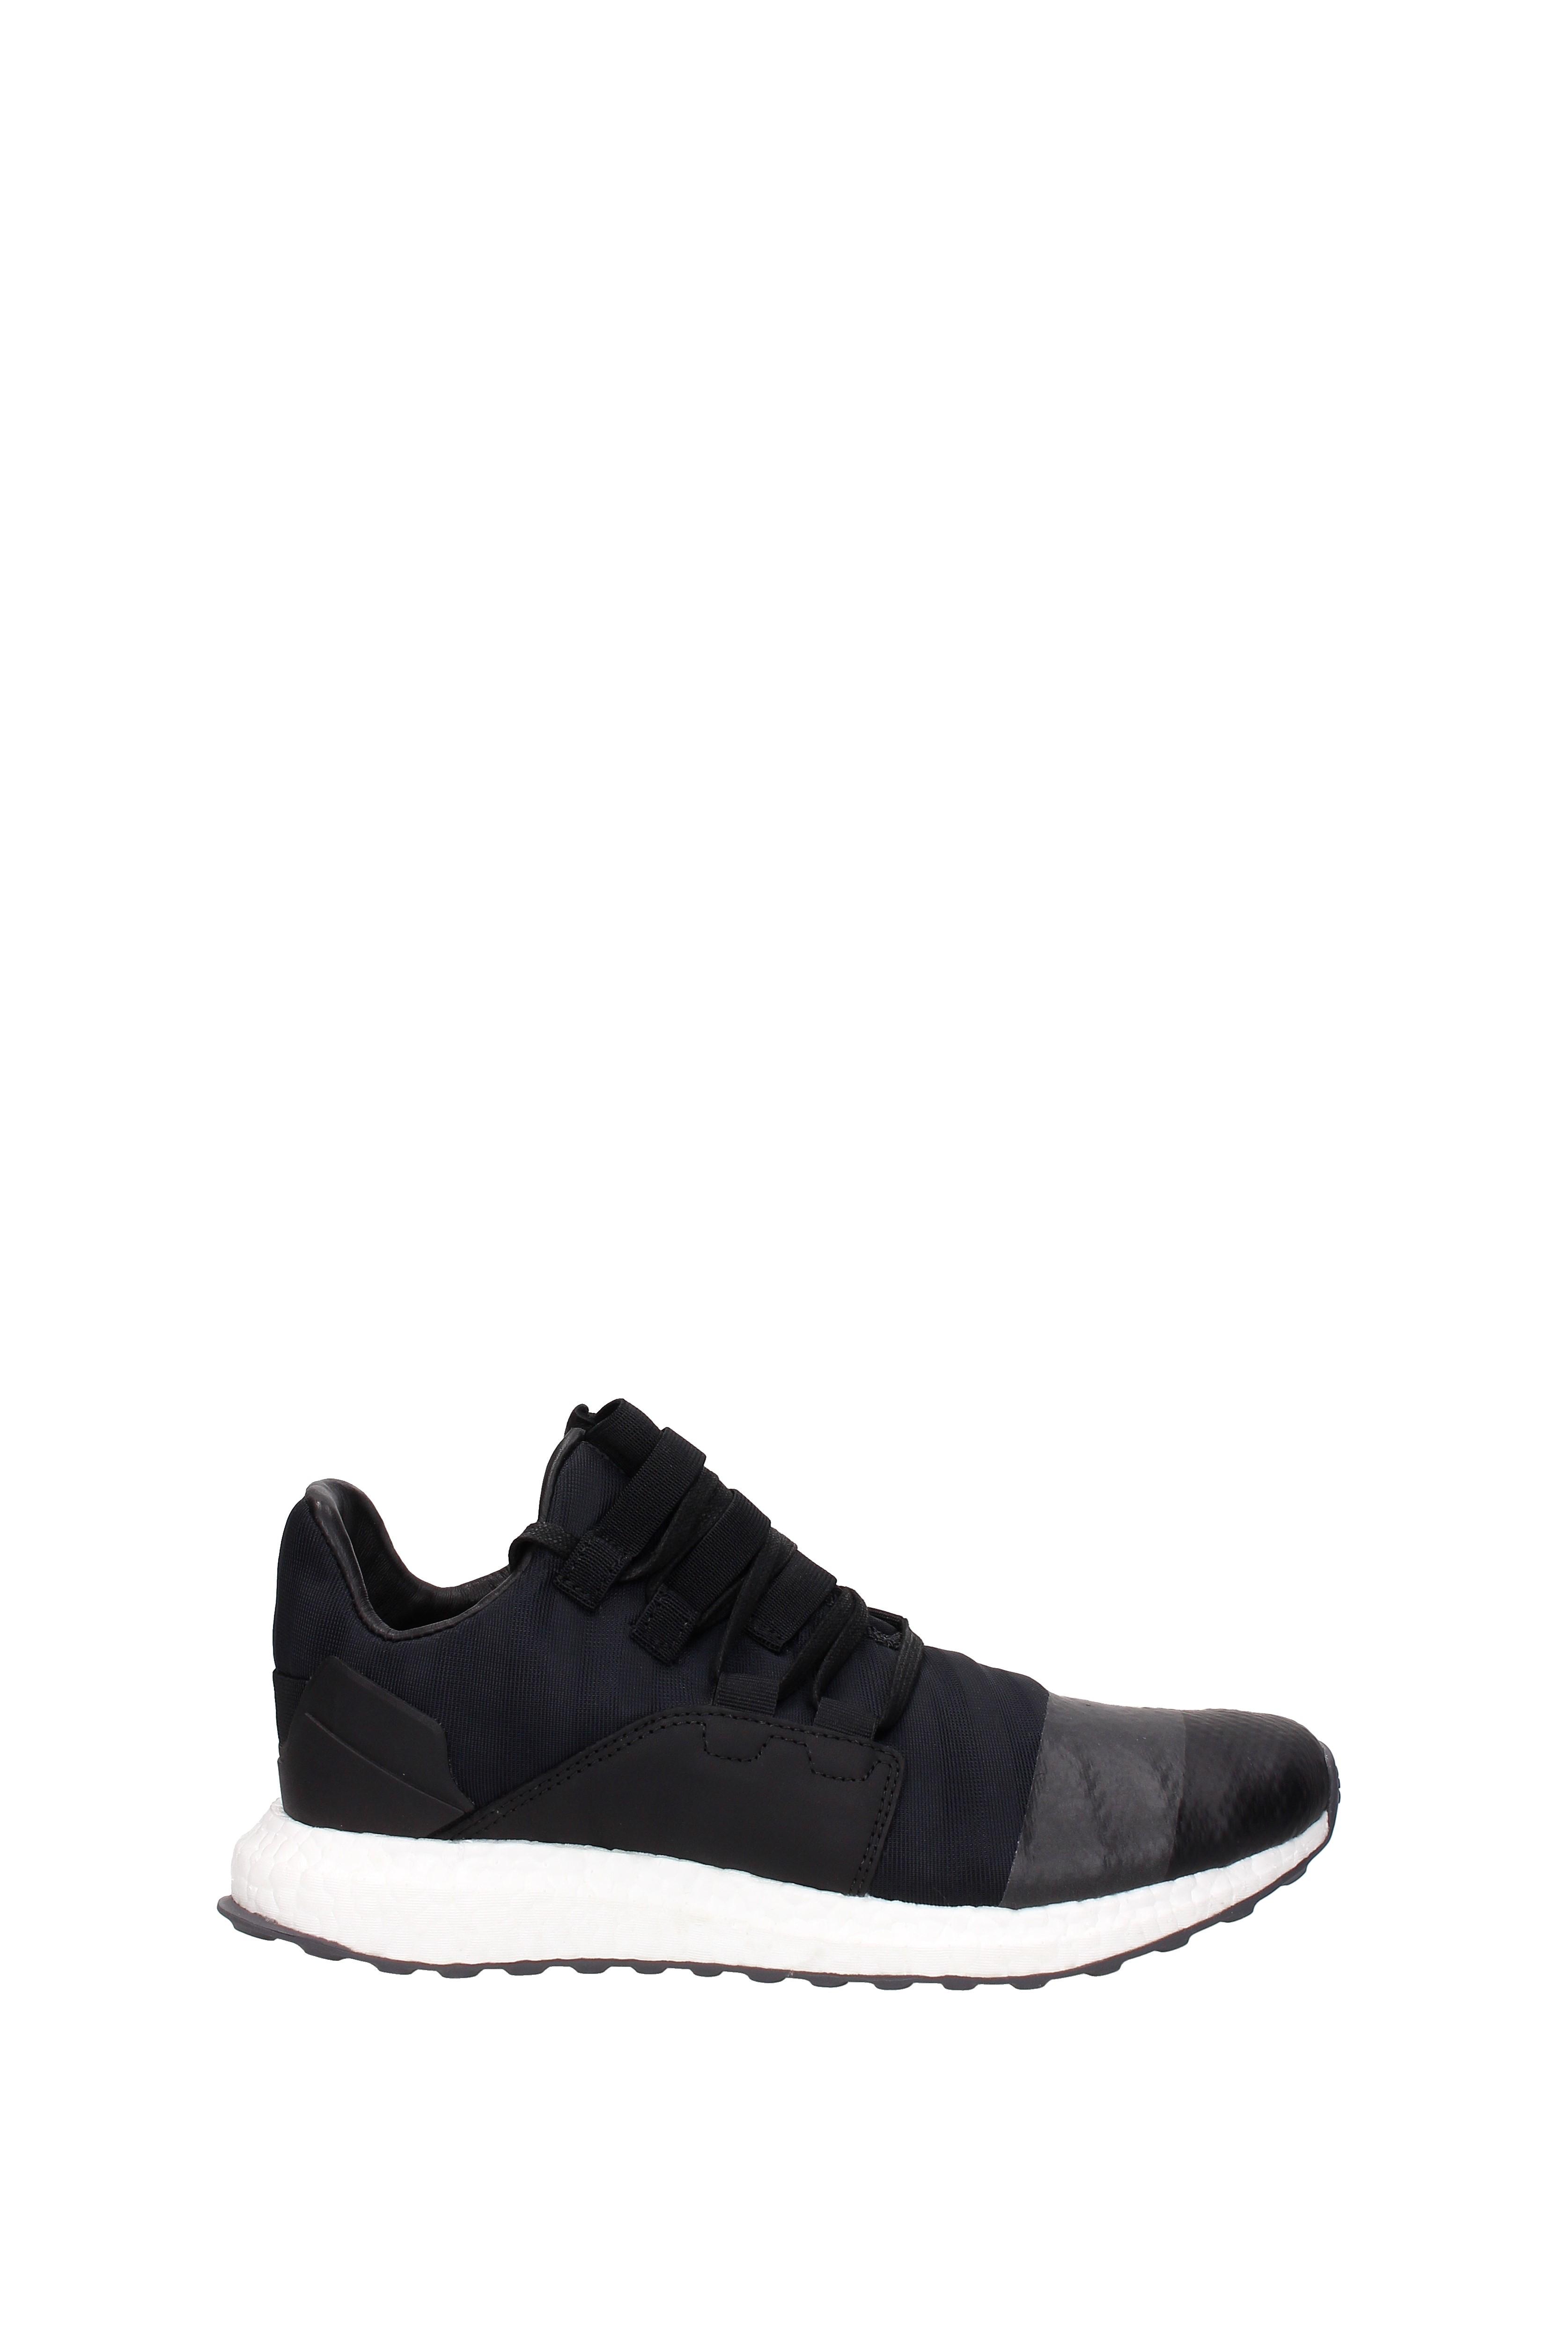 Sneakers-Y3-Yamamoto-kozono-low-Herren-Stoff-1BY263